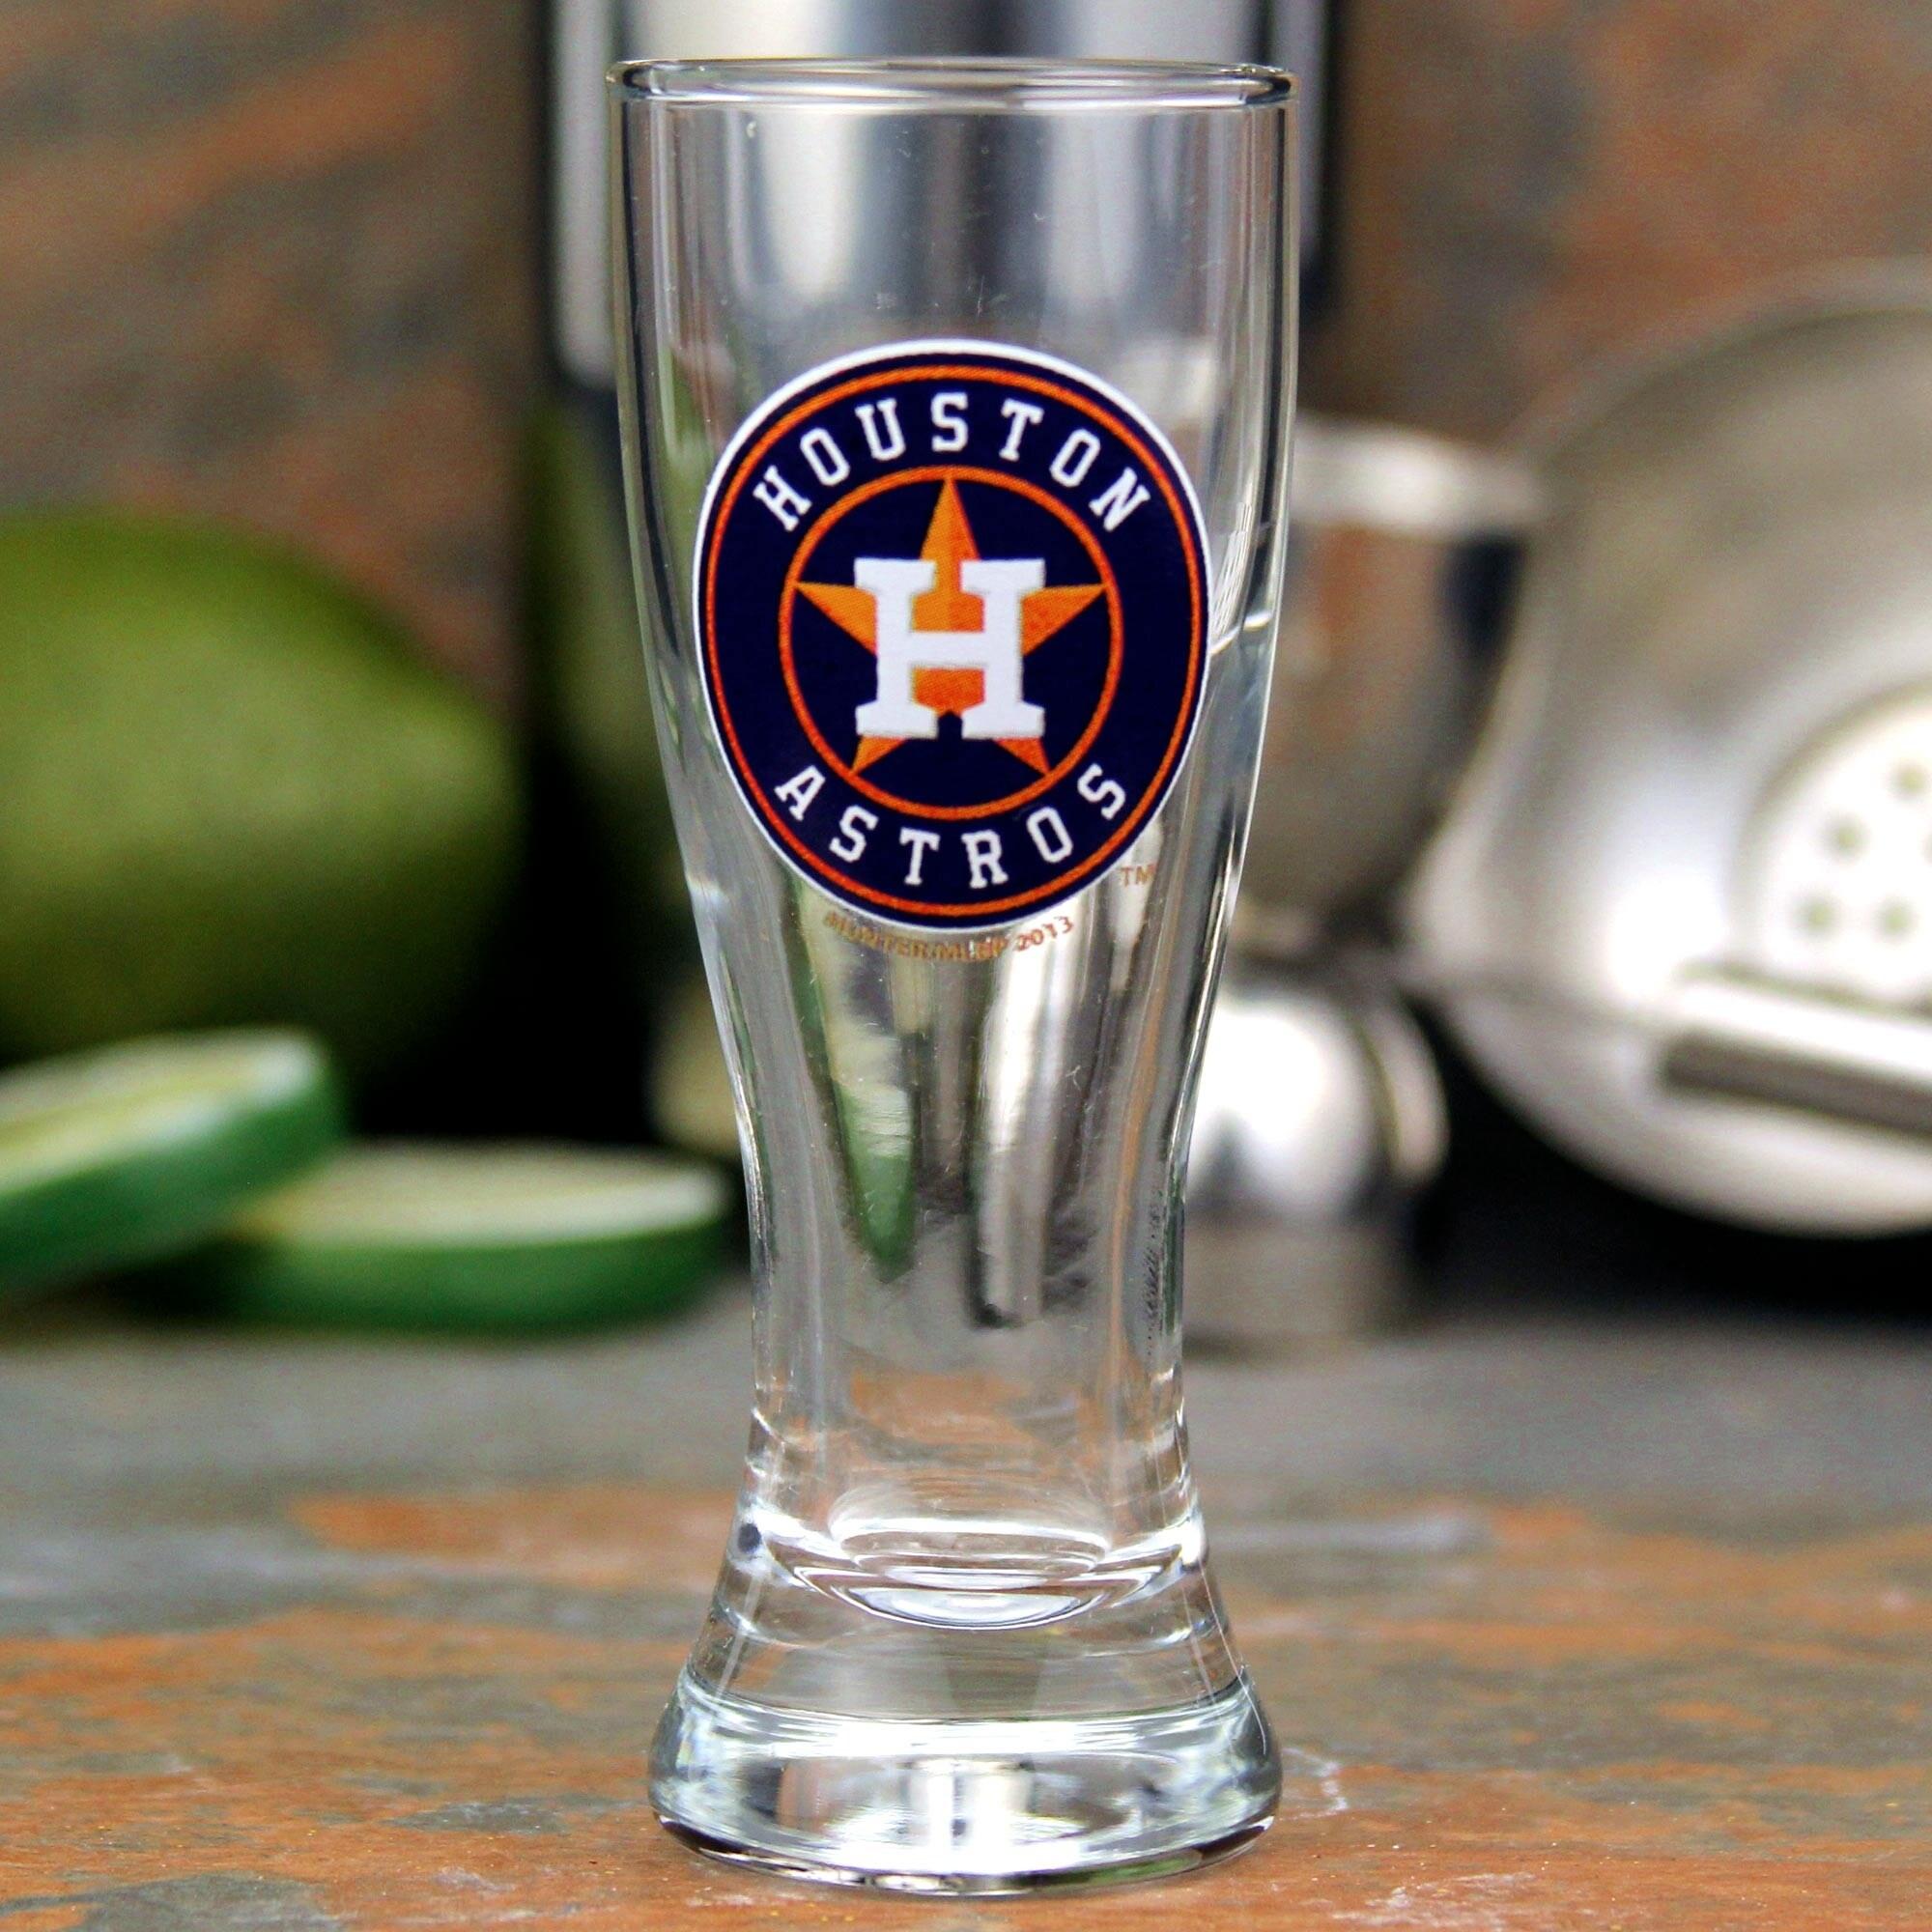 Houston Astros 2oz. Pilsner Collector Glass